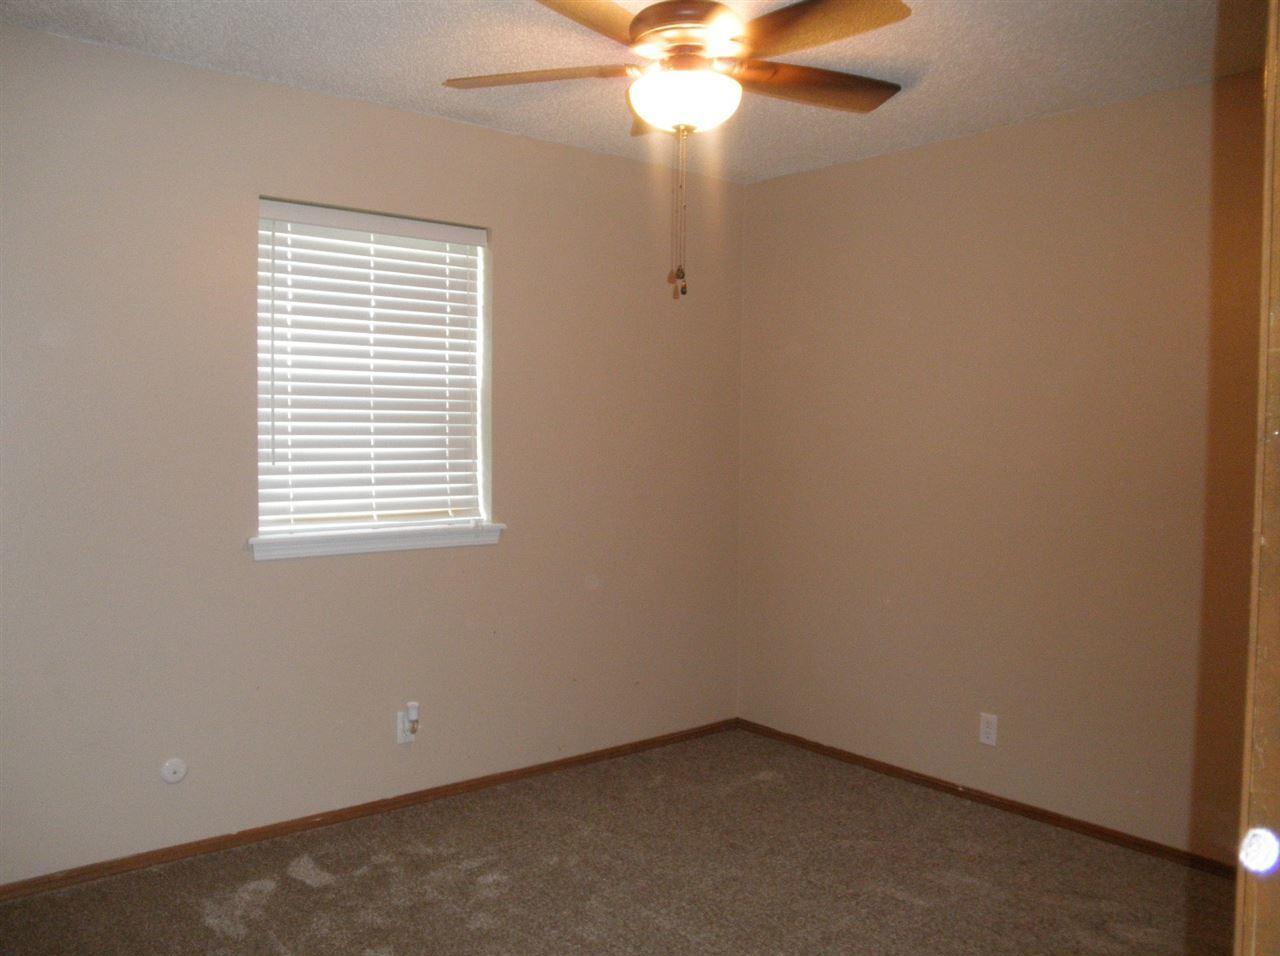 Sold Cross Sale W/ MLS | 300 Lora Ponca City, OK 74601 9